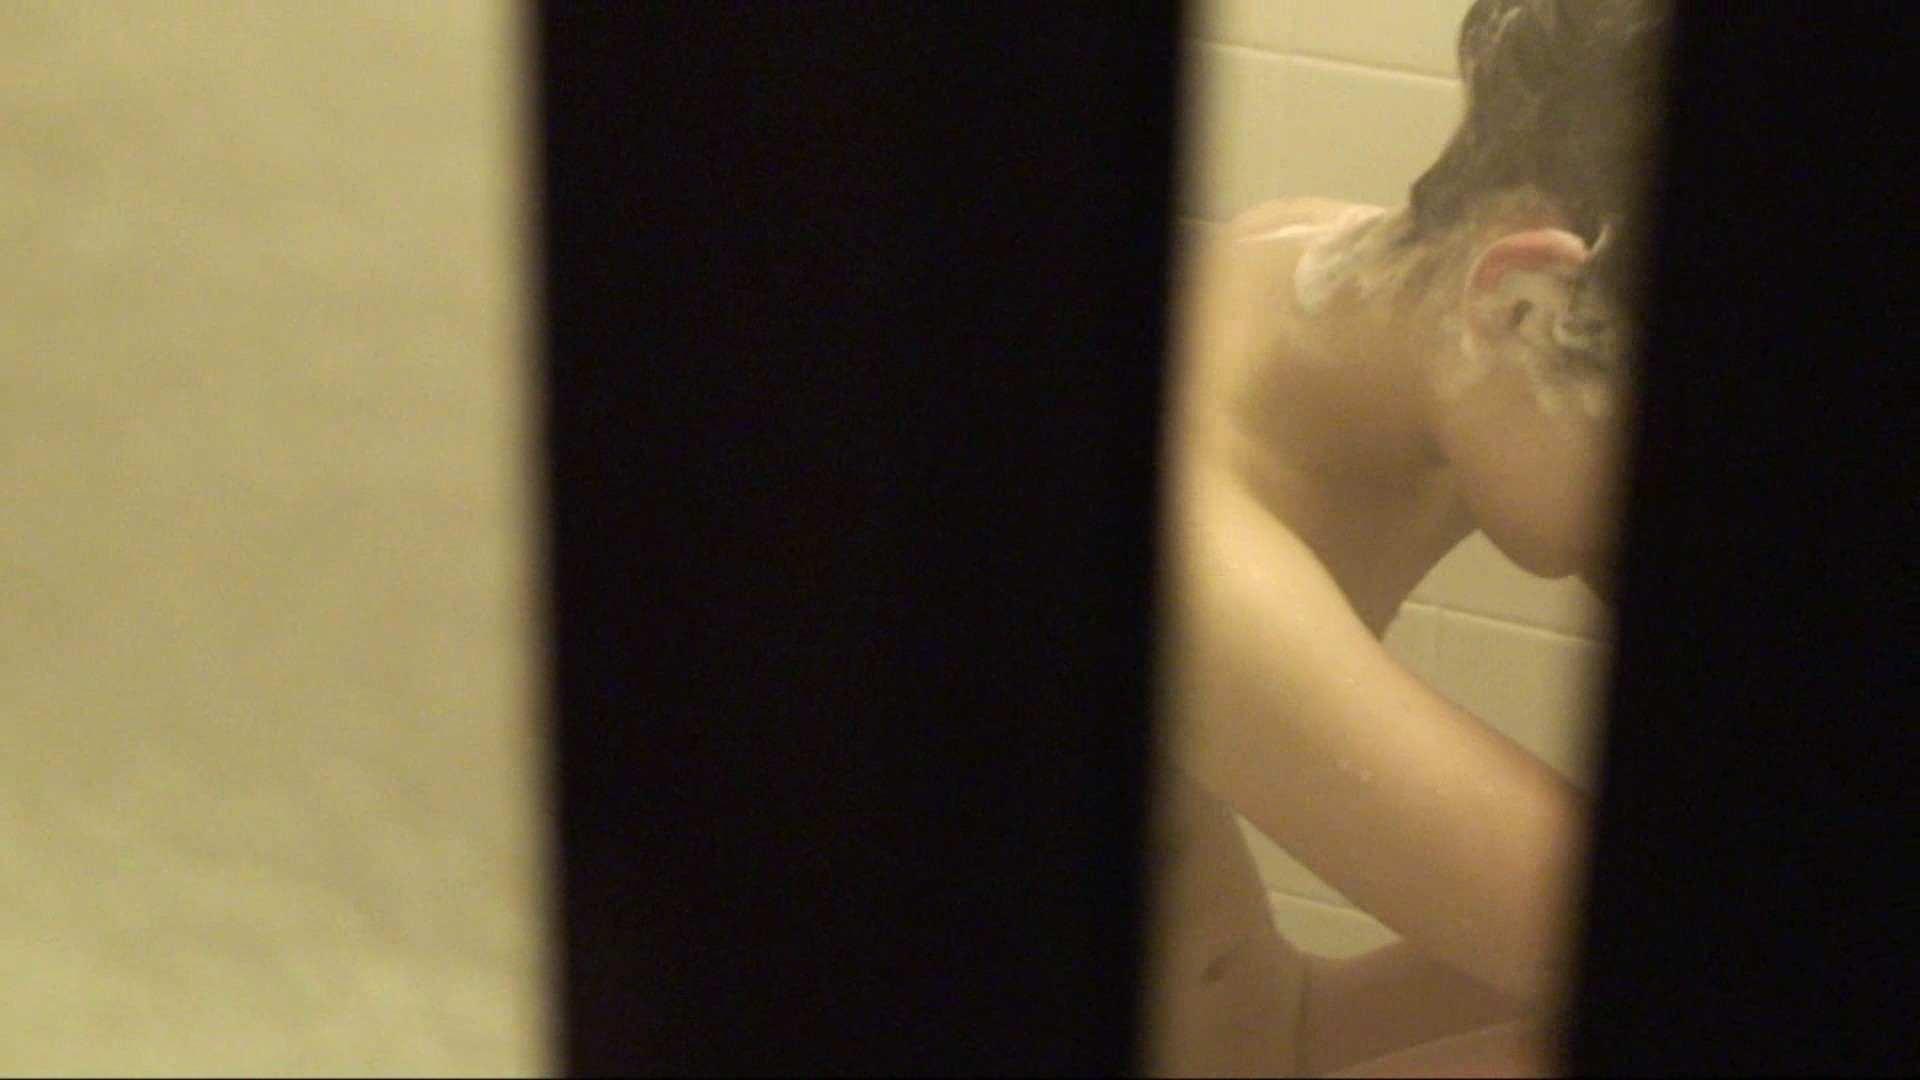 vol.02超可愛すぎる彼女の裸体をハイビジョンで!至近距離での眺め最高! 覗き ワレメ無修正動画無料 78pic 17